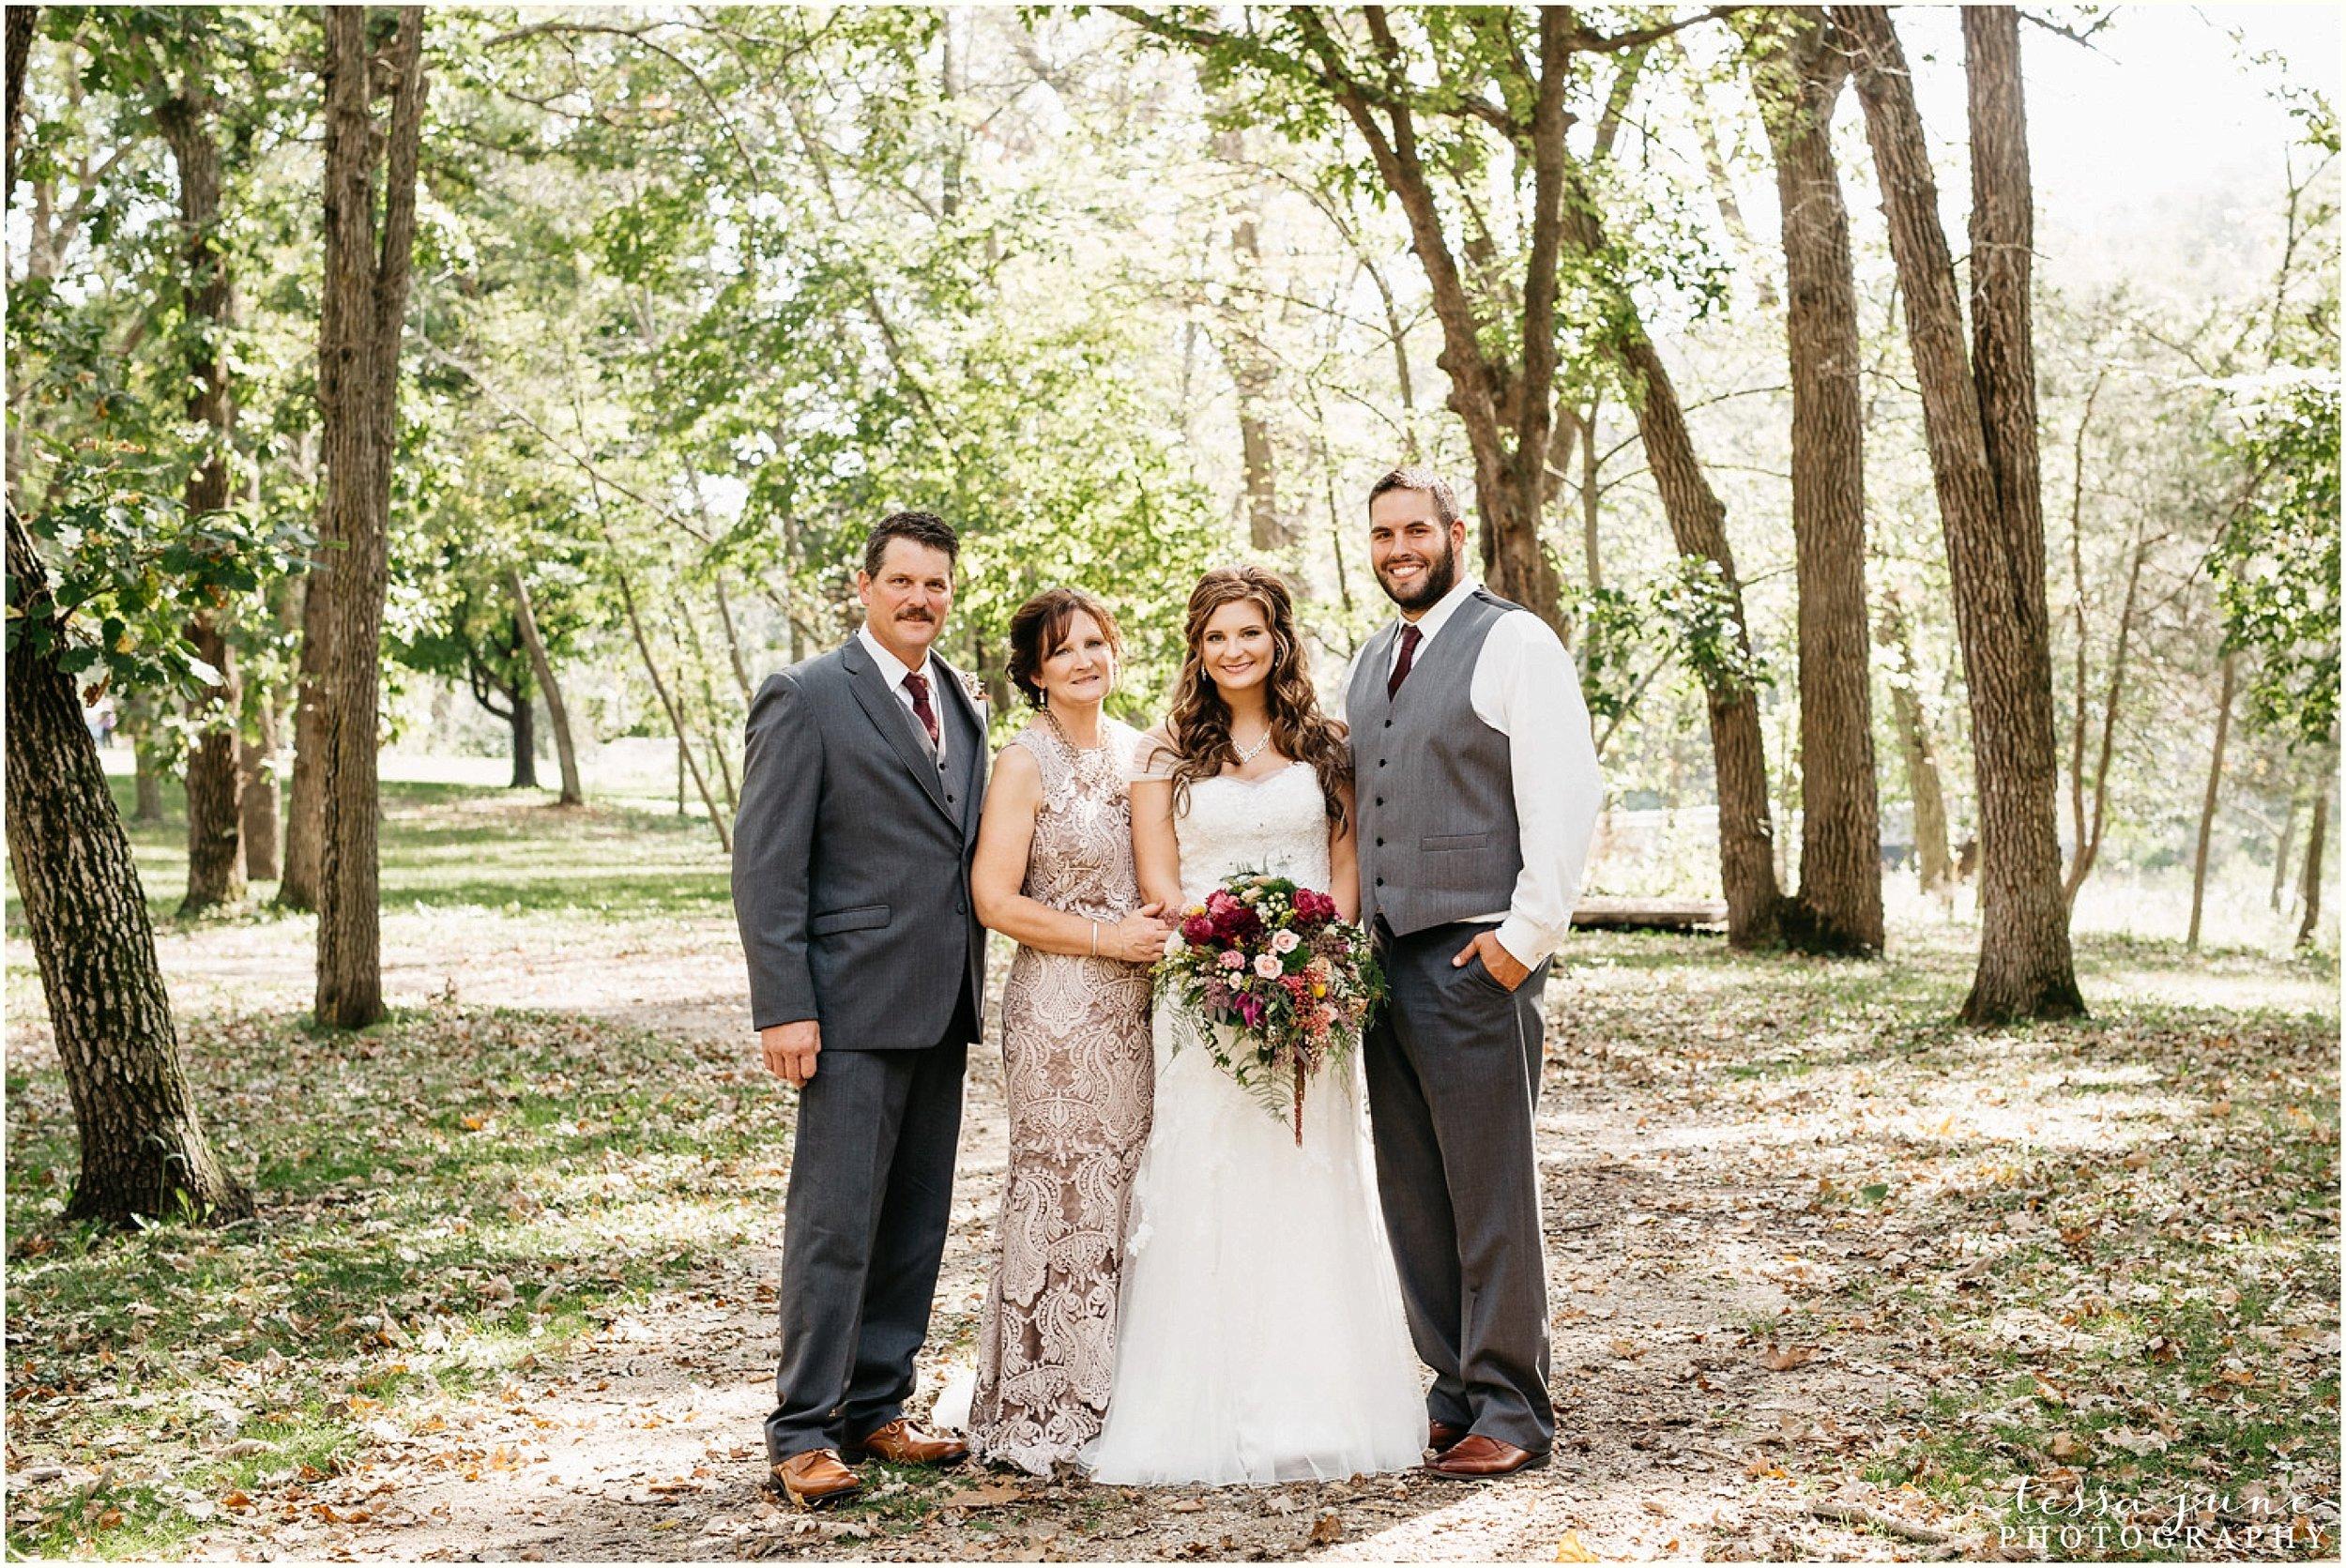 bohemian-minnesota-wedding-mismatched-bridesmaid-dresses-waterfall-st-cloud-tessa-june-photography-91.jpg